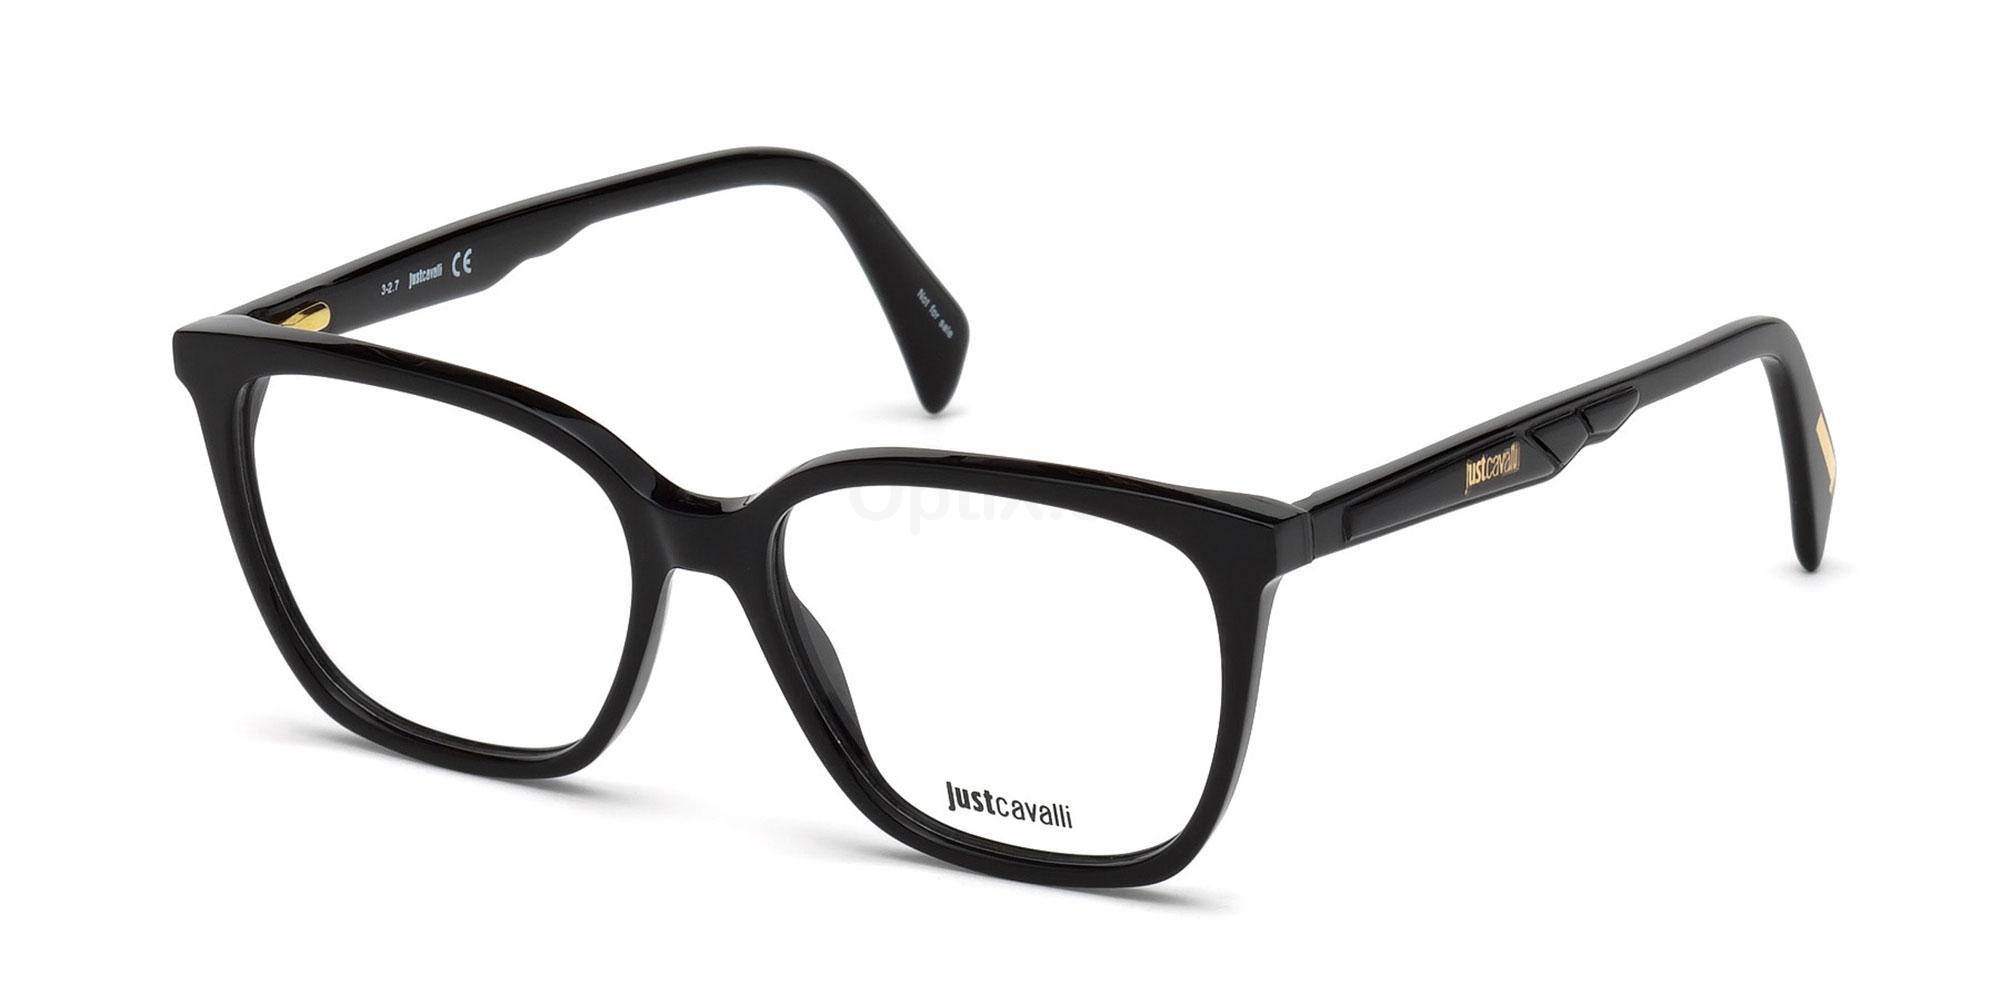 001 JC0853 Glasses, Just Cavalli